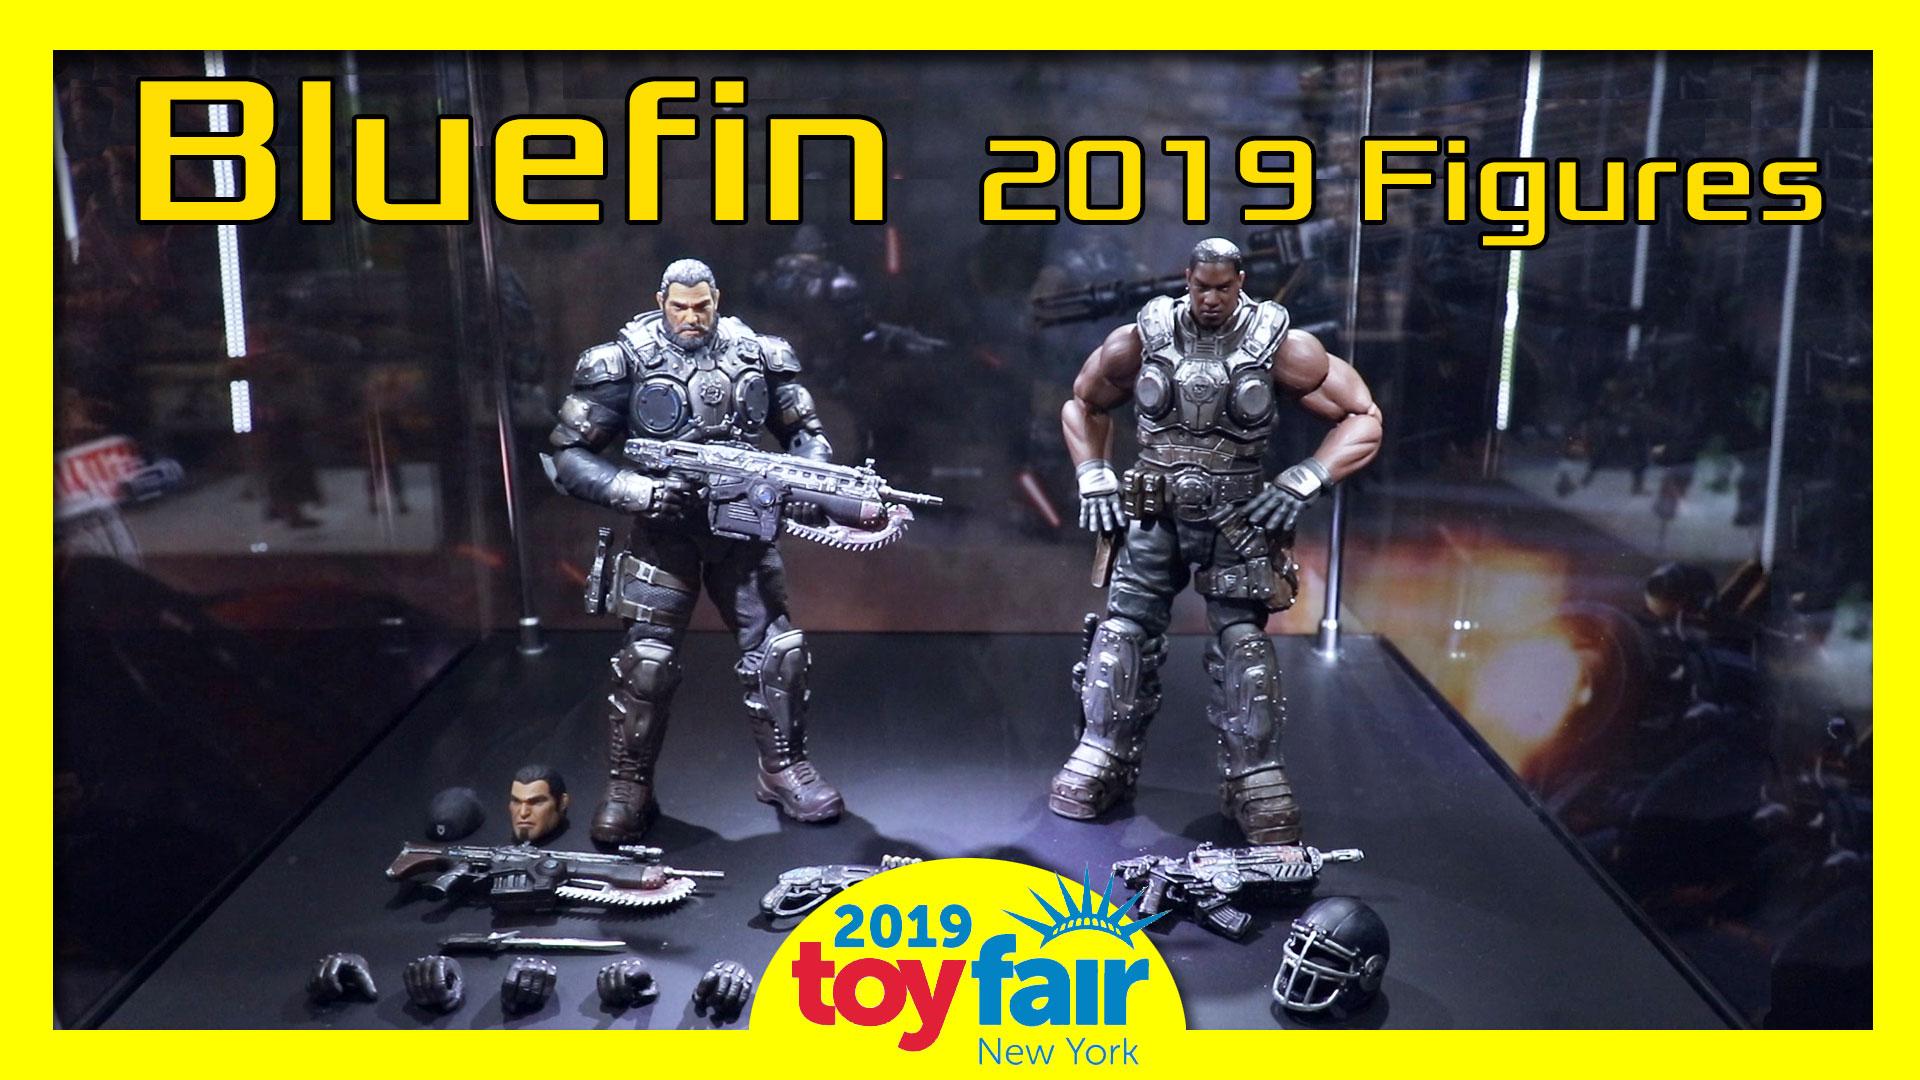 Bluefin @Toyfair 2019